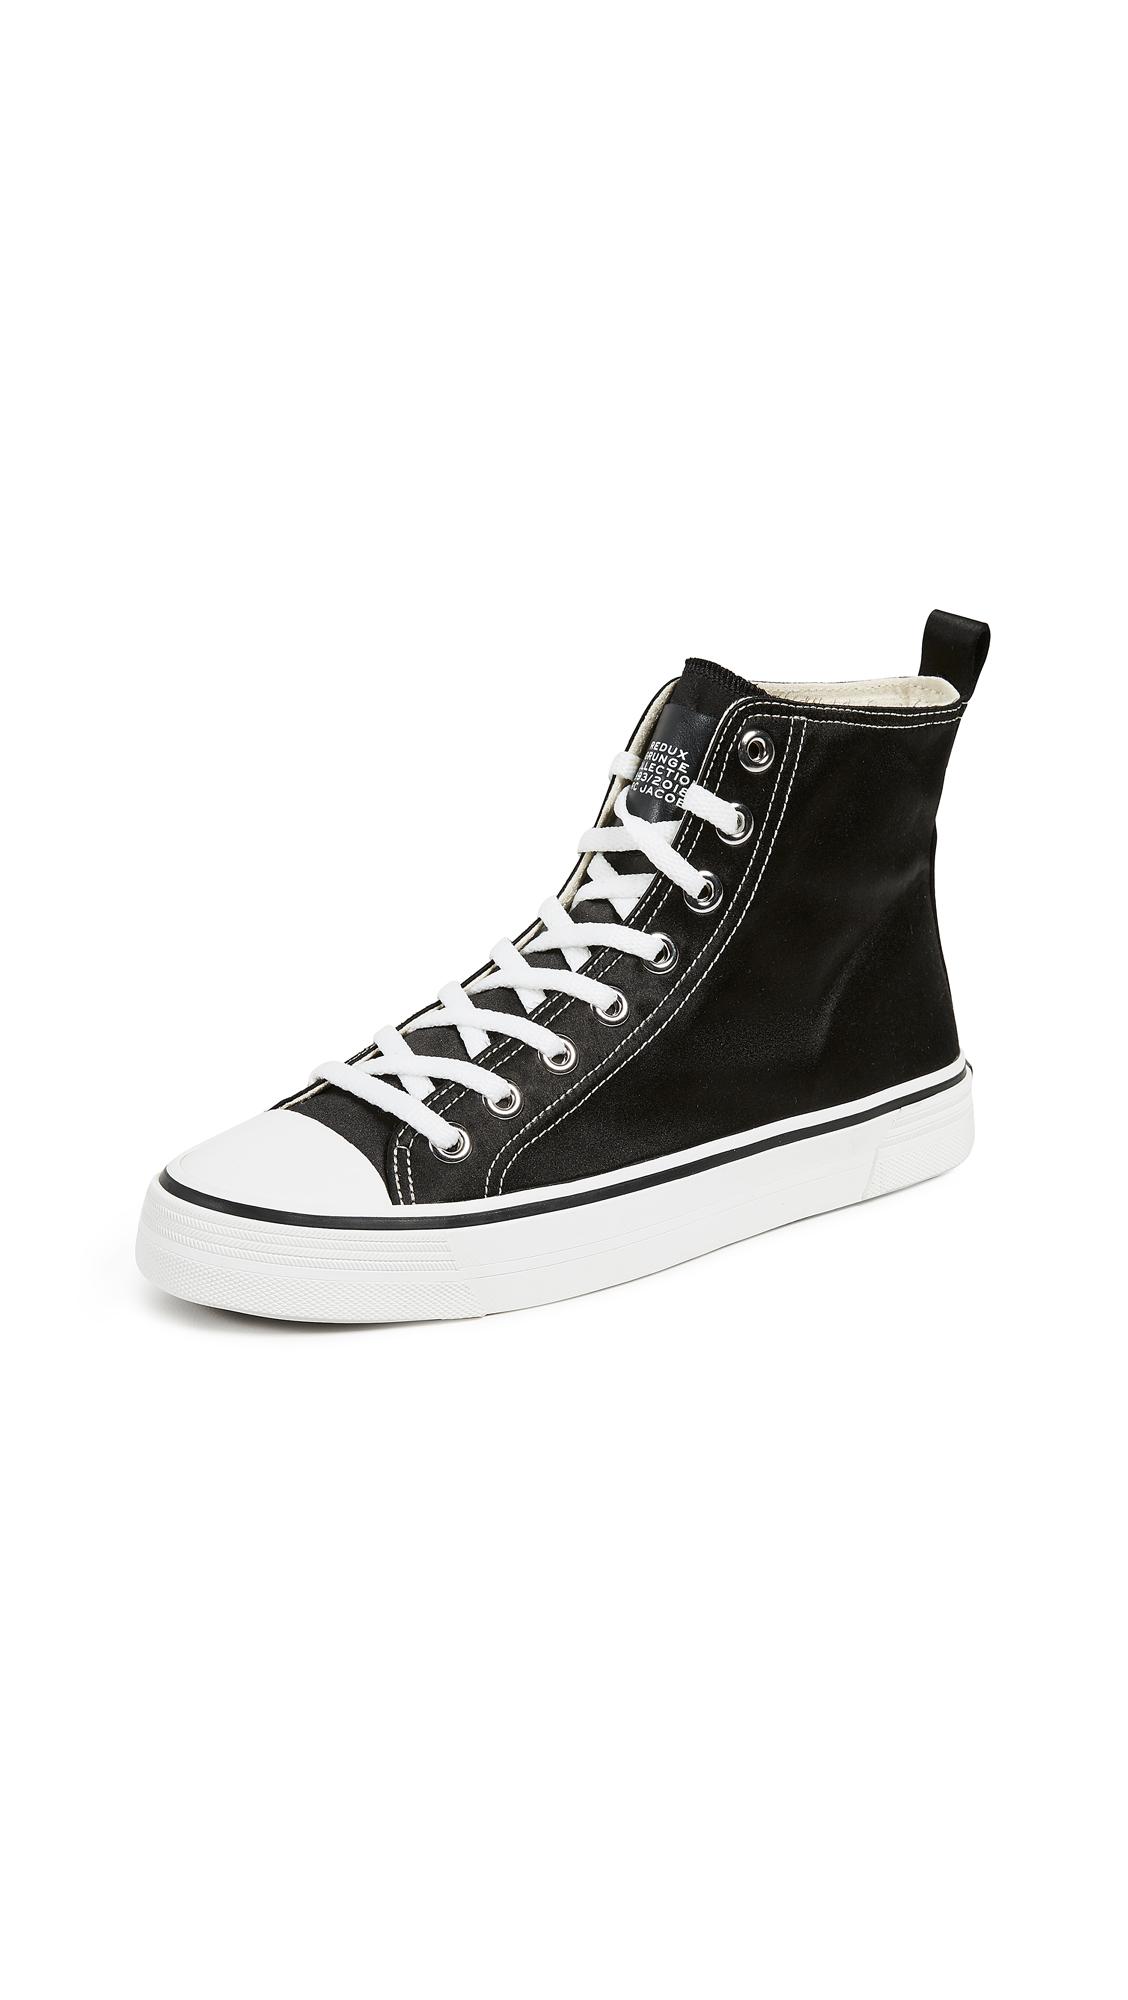 Marc Jacobs Grunge High Top Sneakers - Black